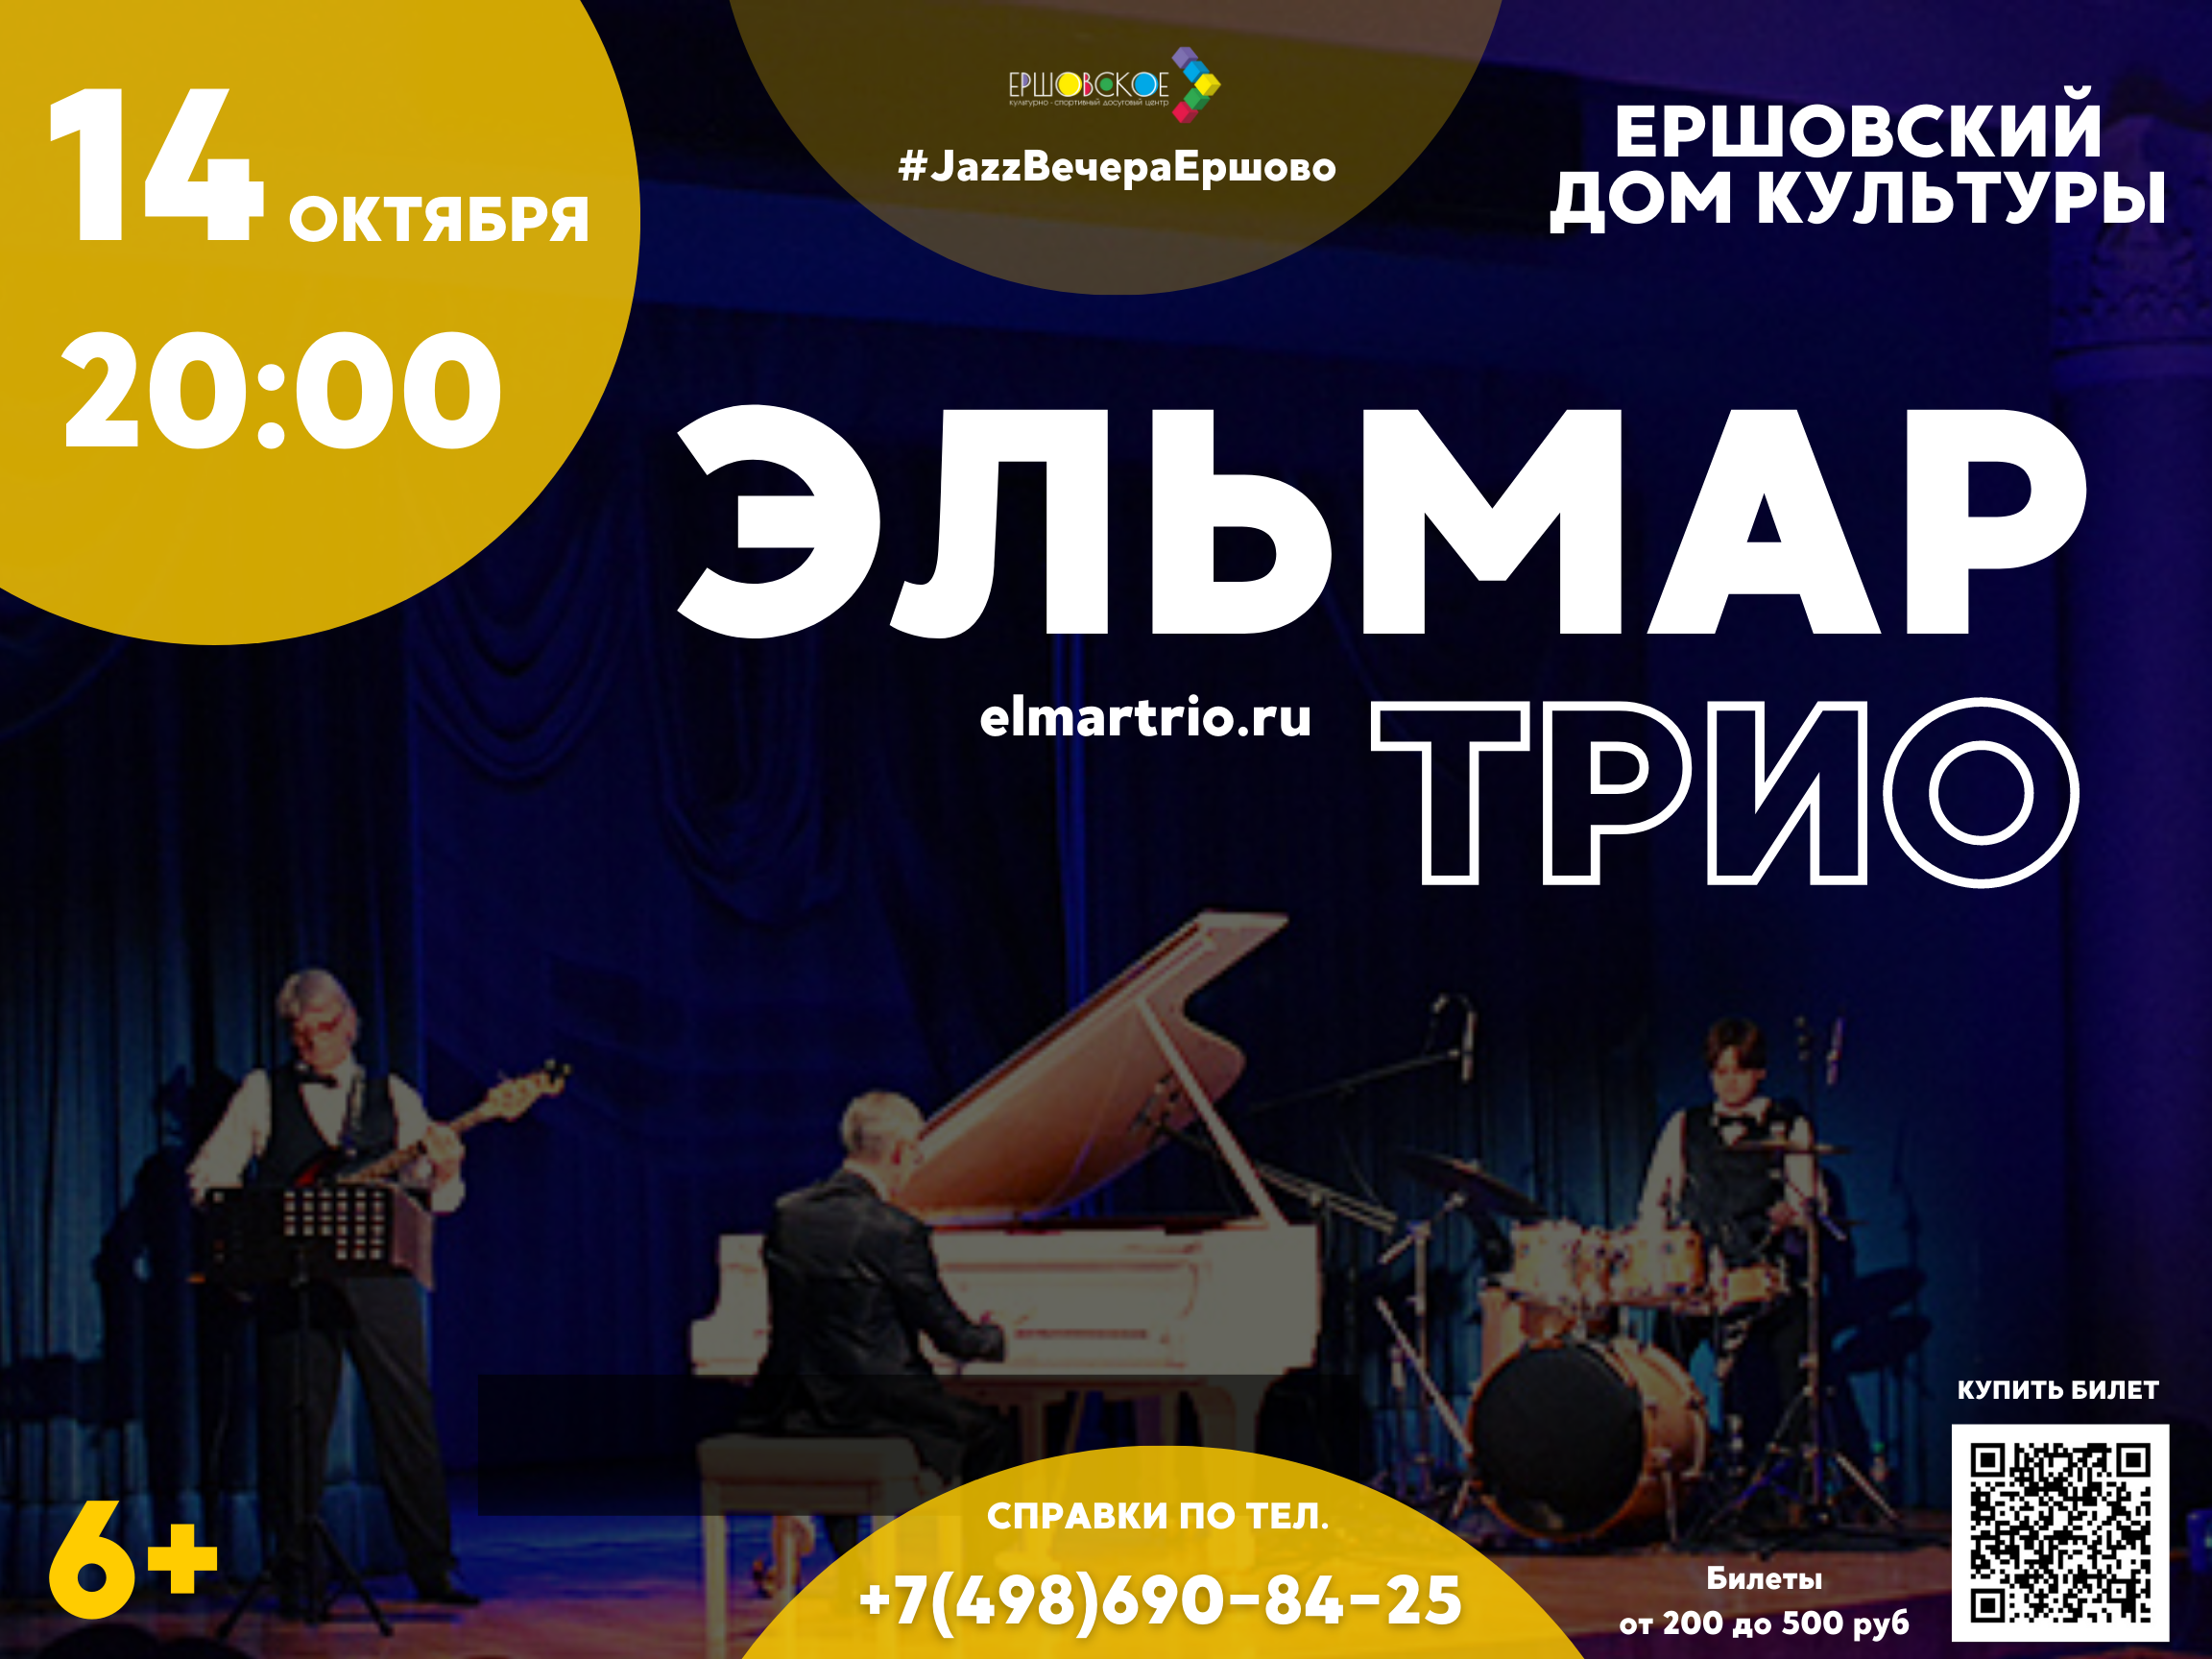 Jazz вечера Ершово с Эльмар Трио